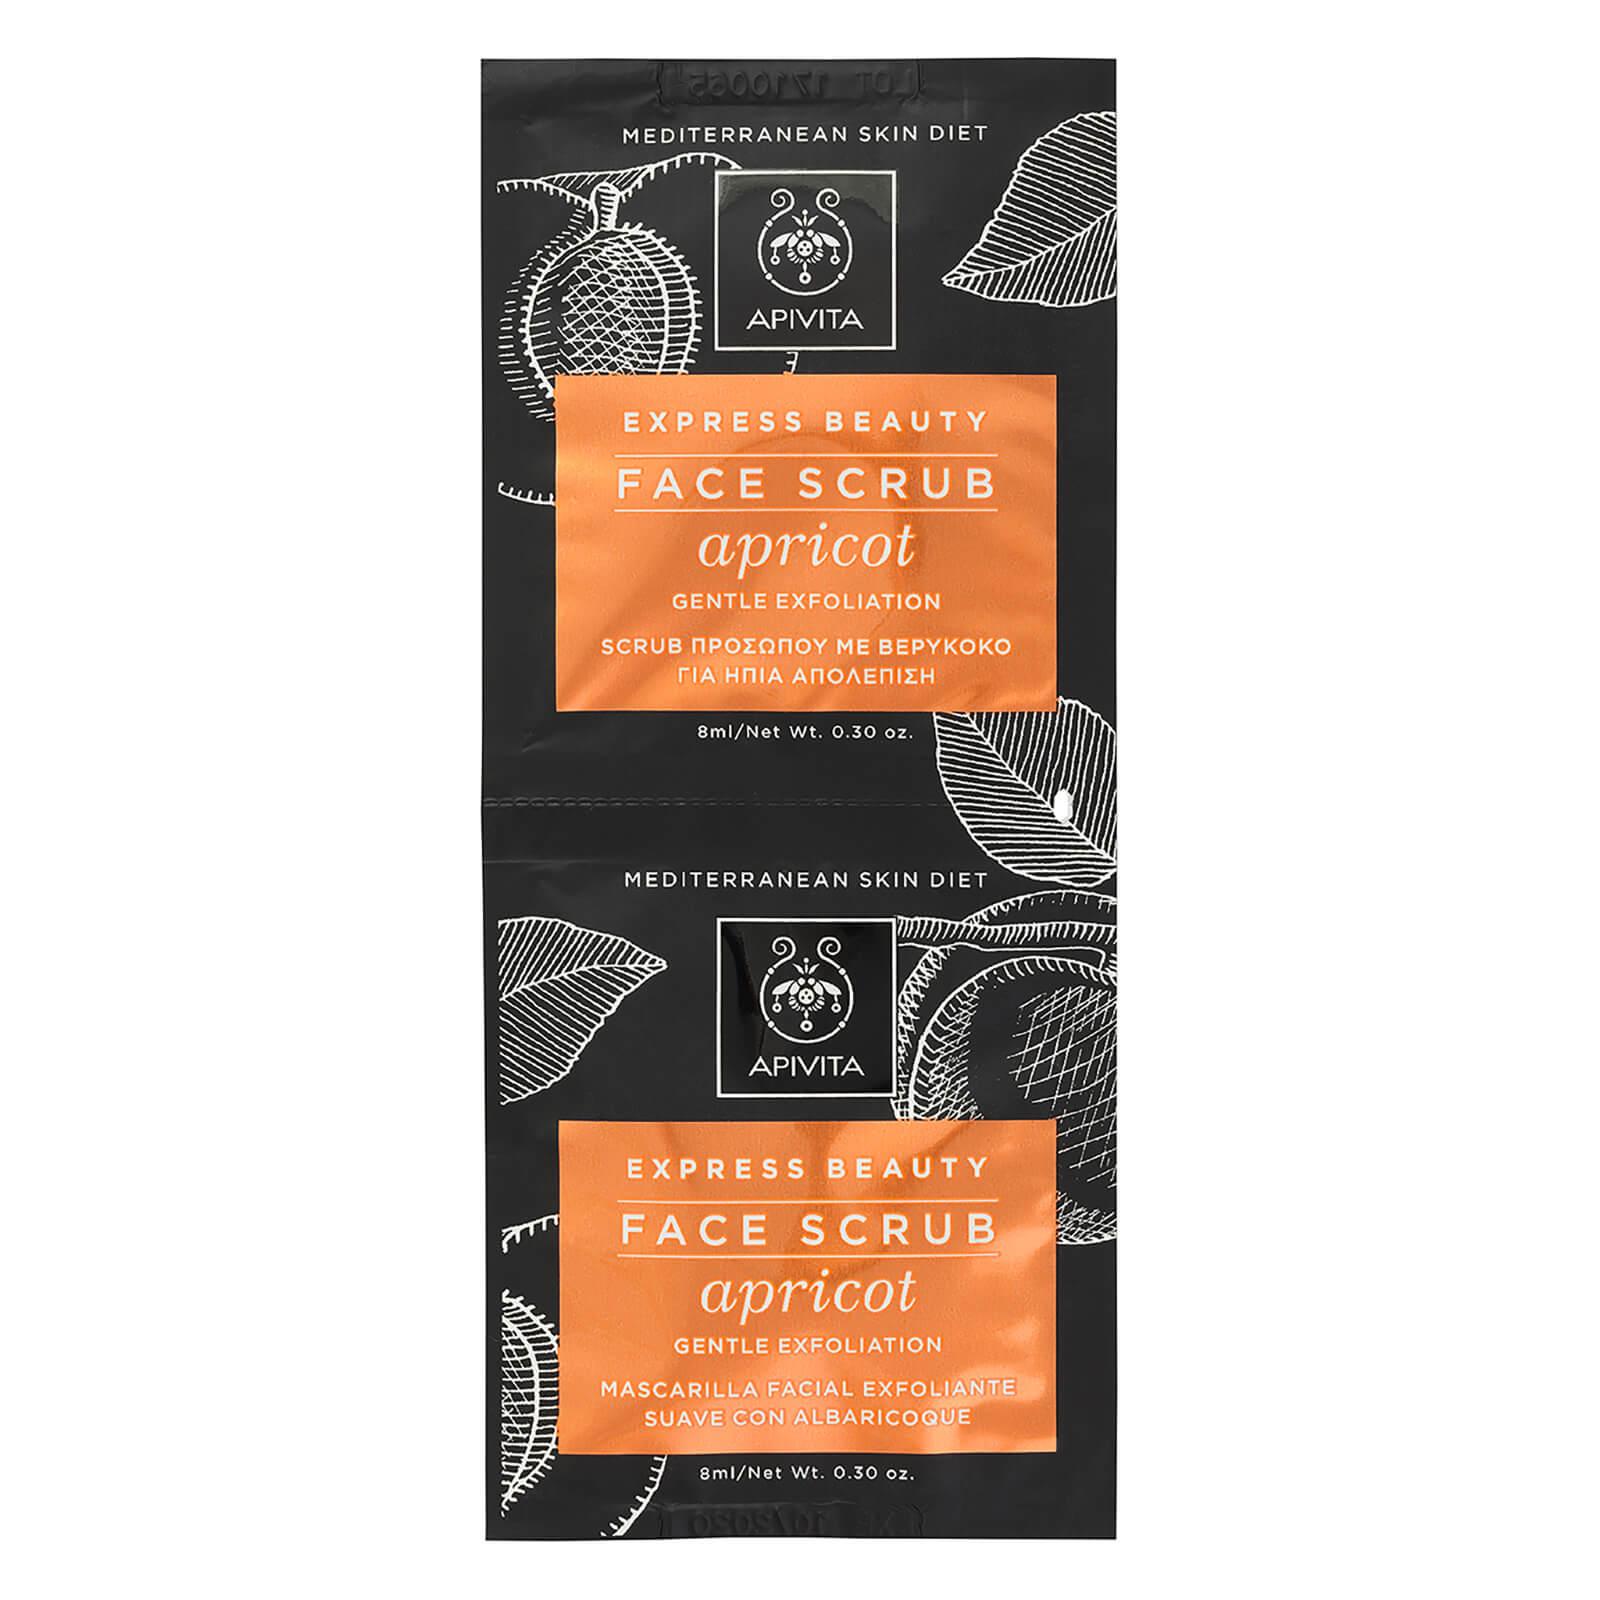 APIVITA Express Face Scrub for Gentle Exfoliation - Apricot 2x8ml